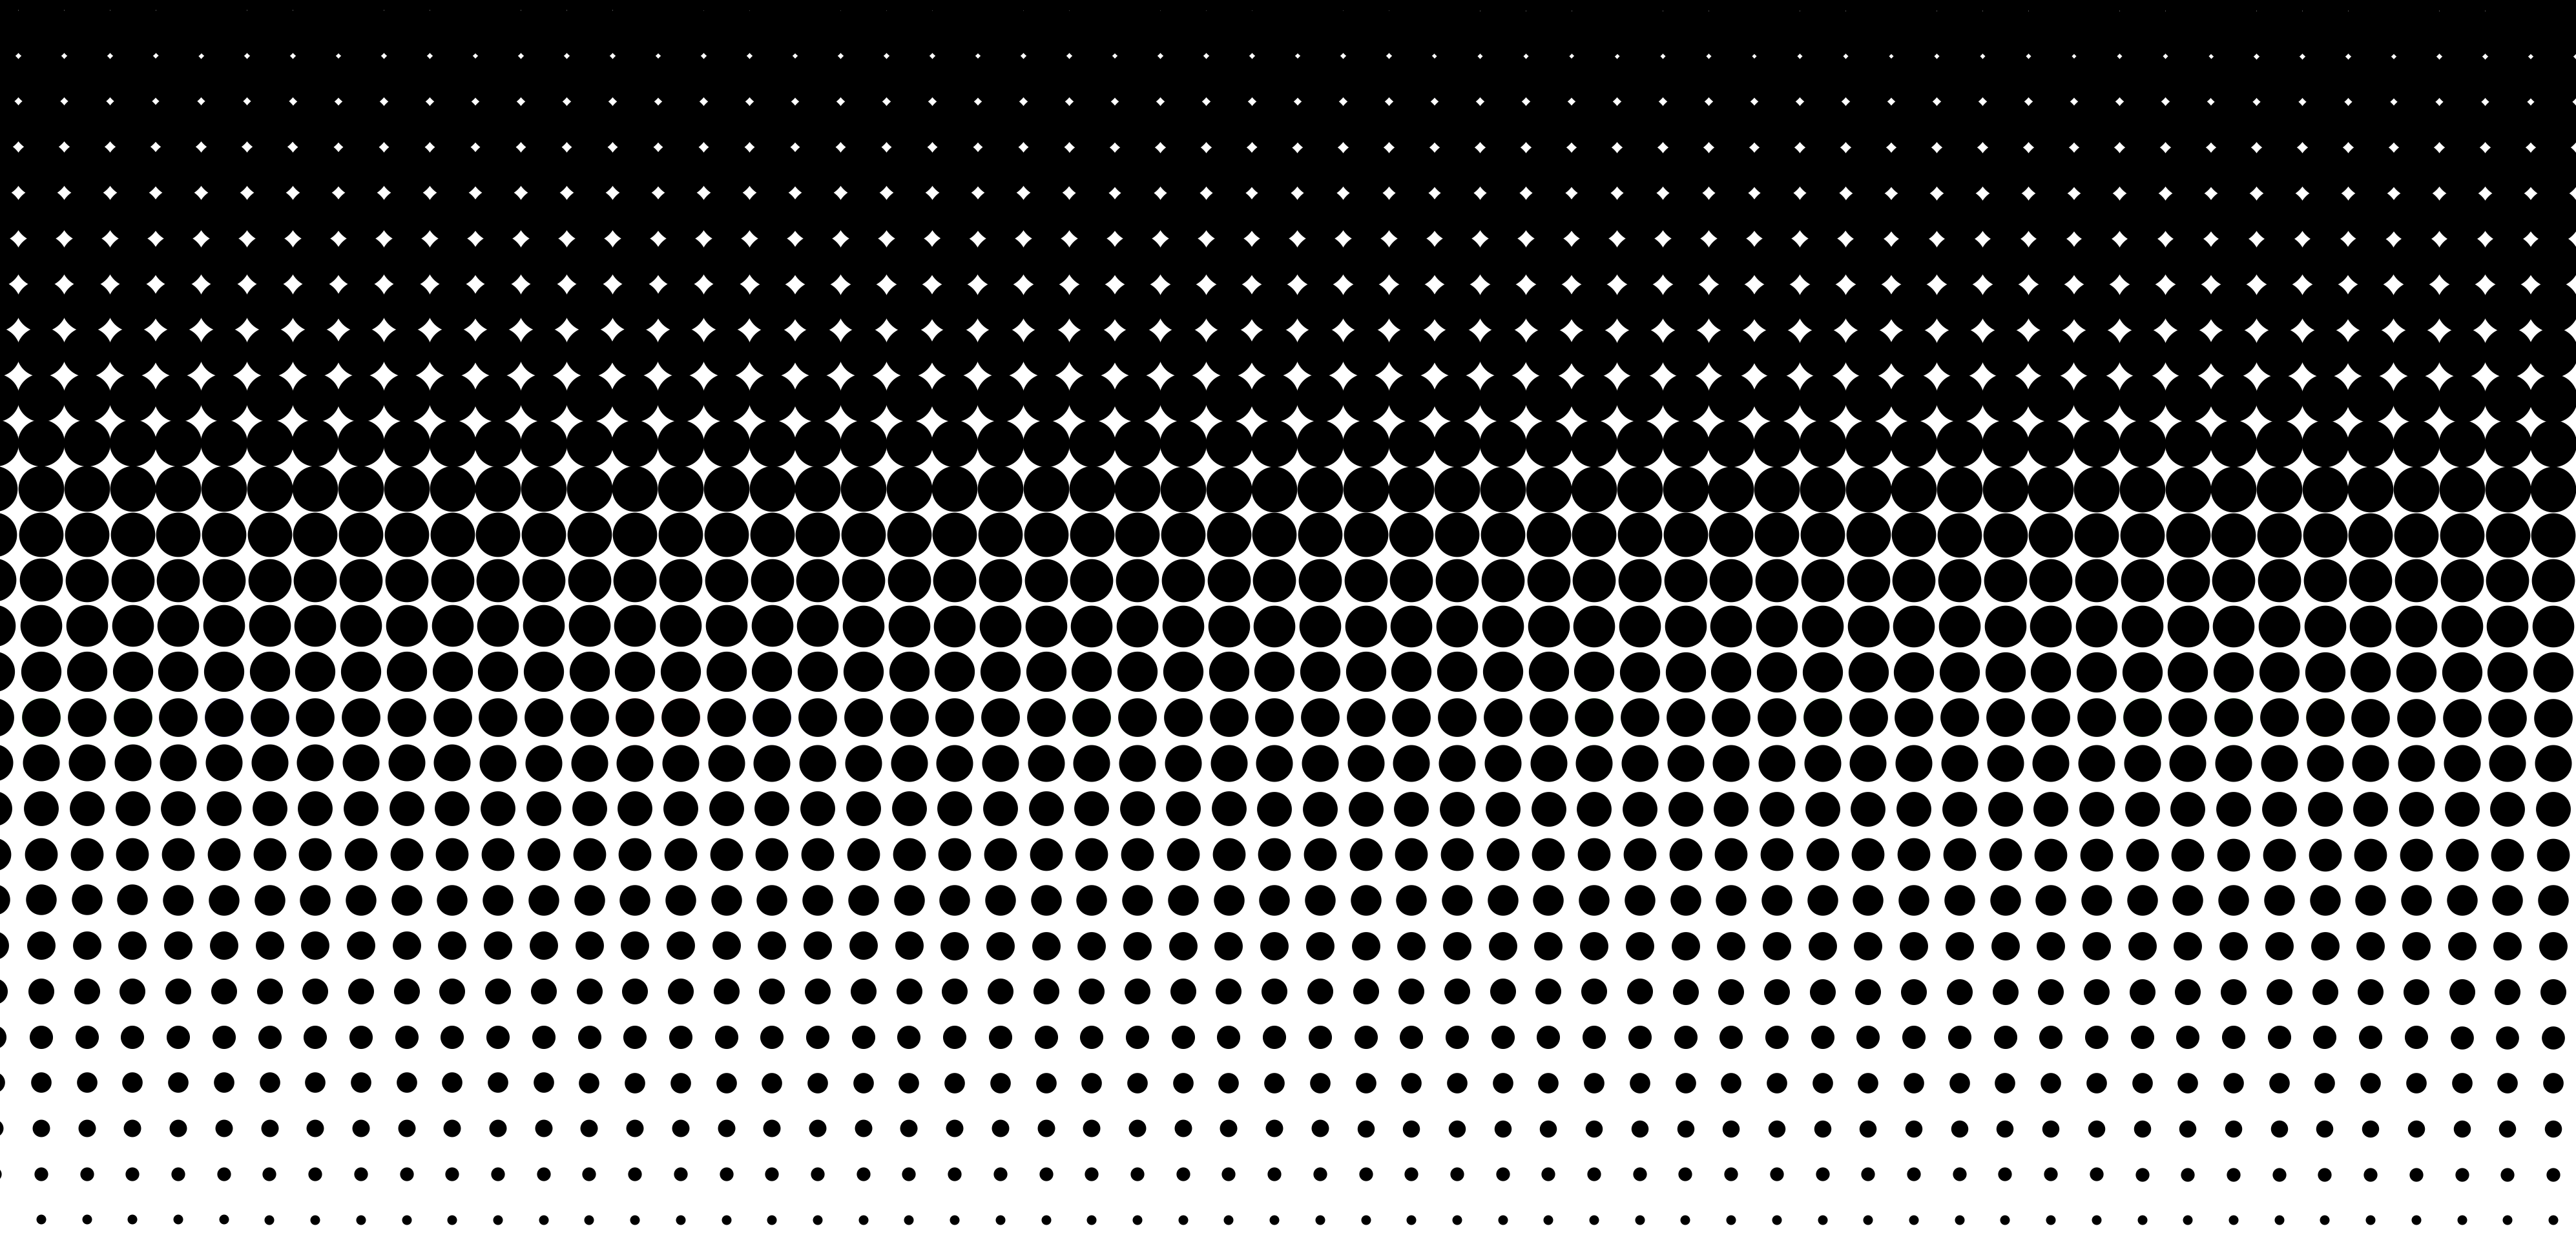 Halftone pattern black white 1 clip art sweet clip art halftone pattern black white 1 clip art voltagebd Gallery